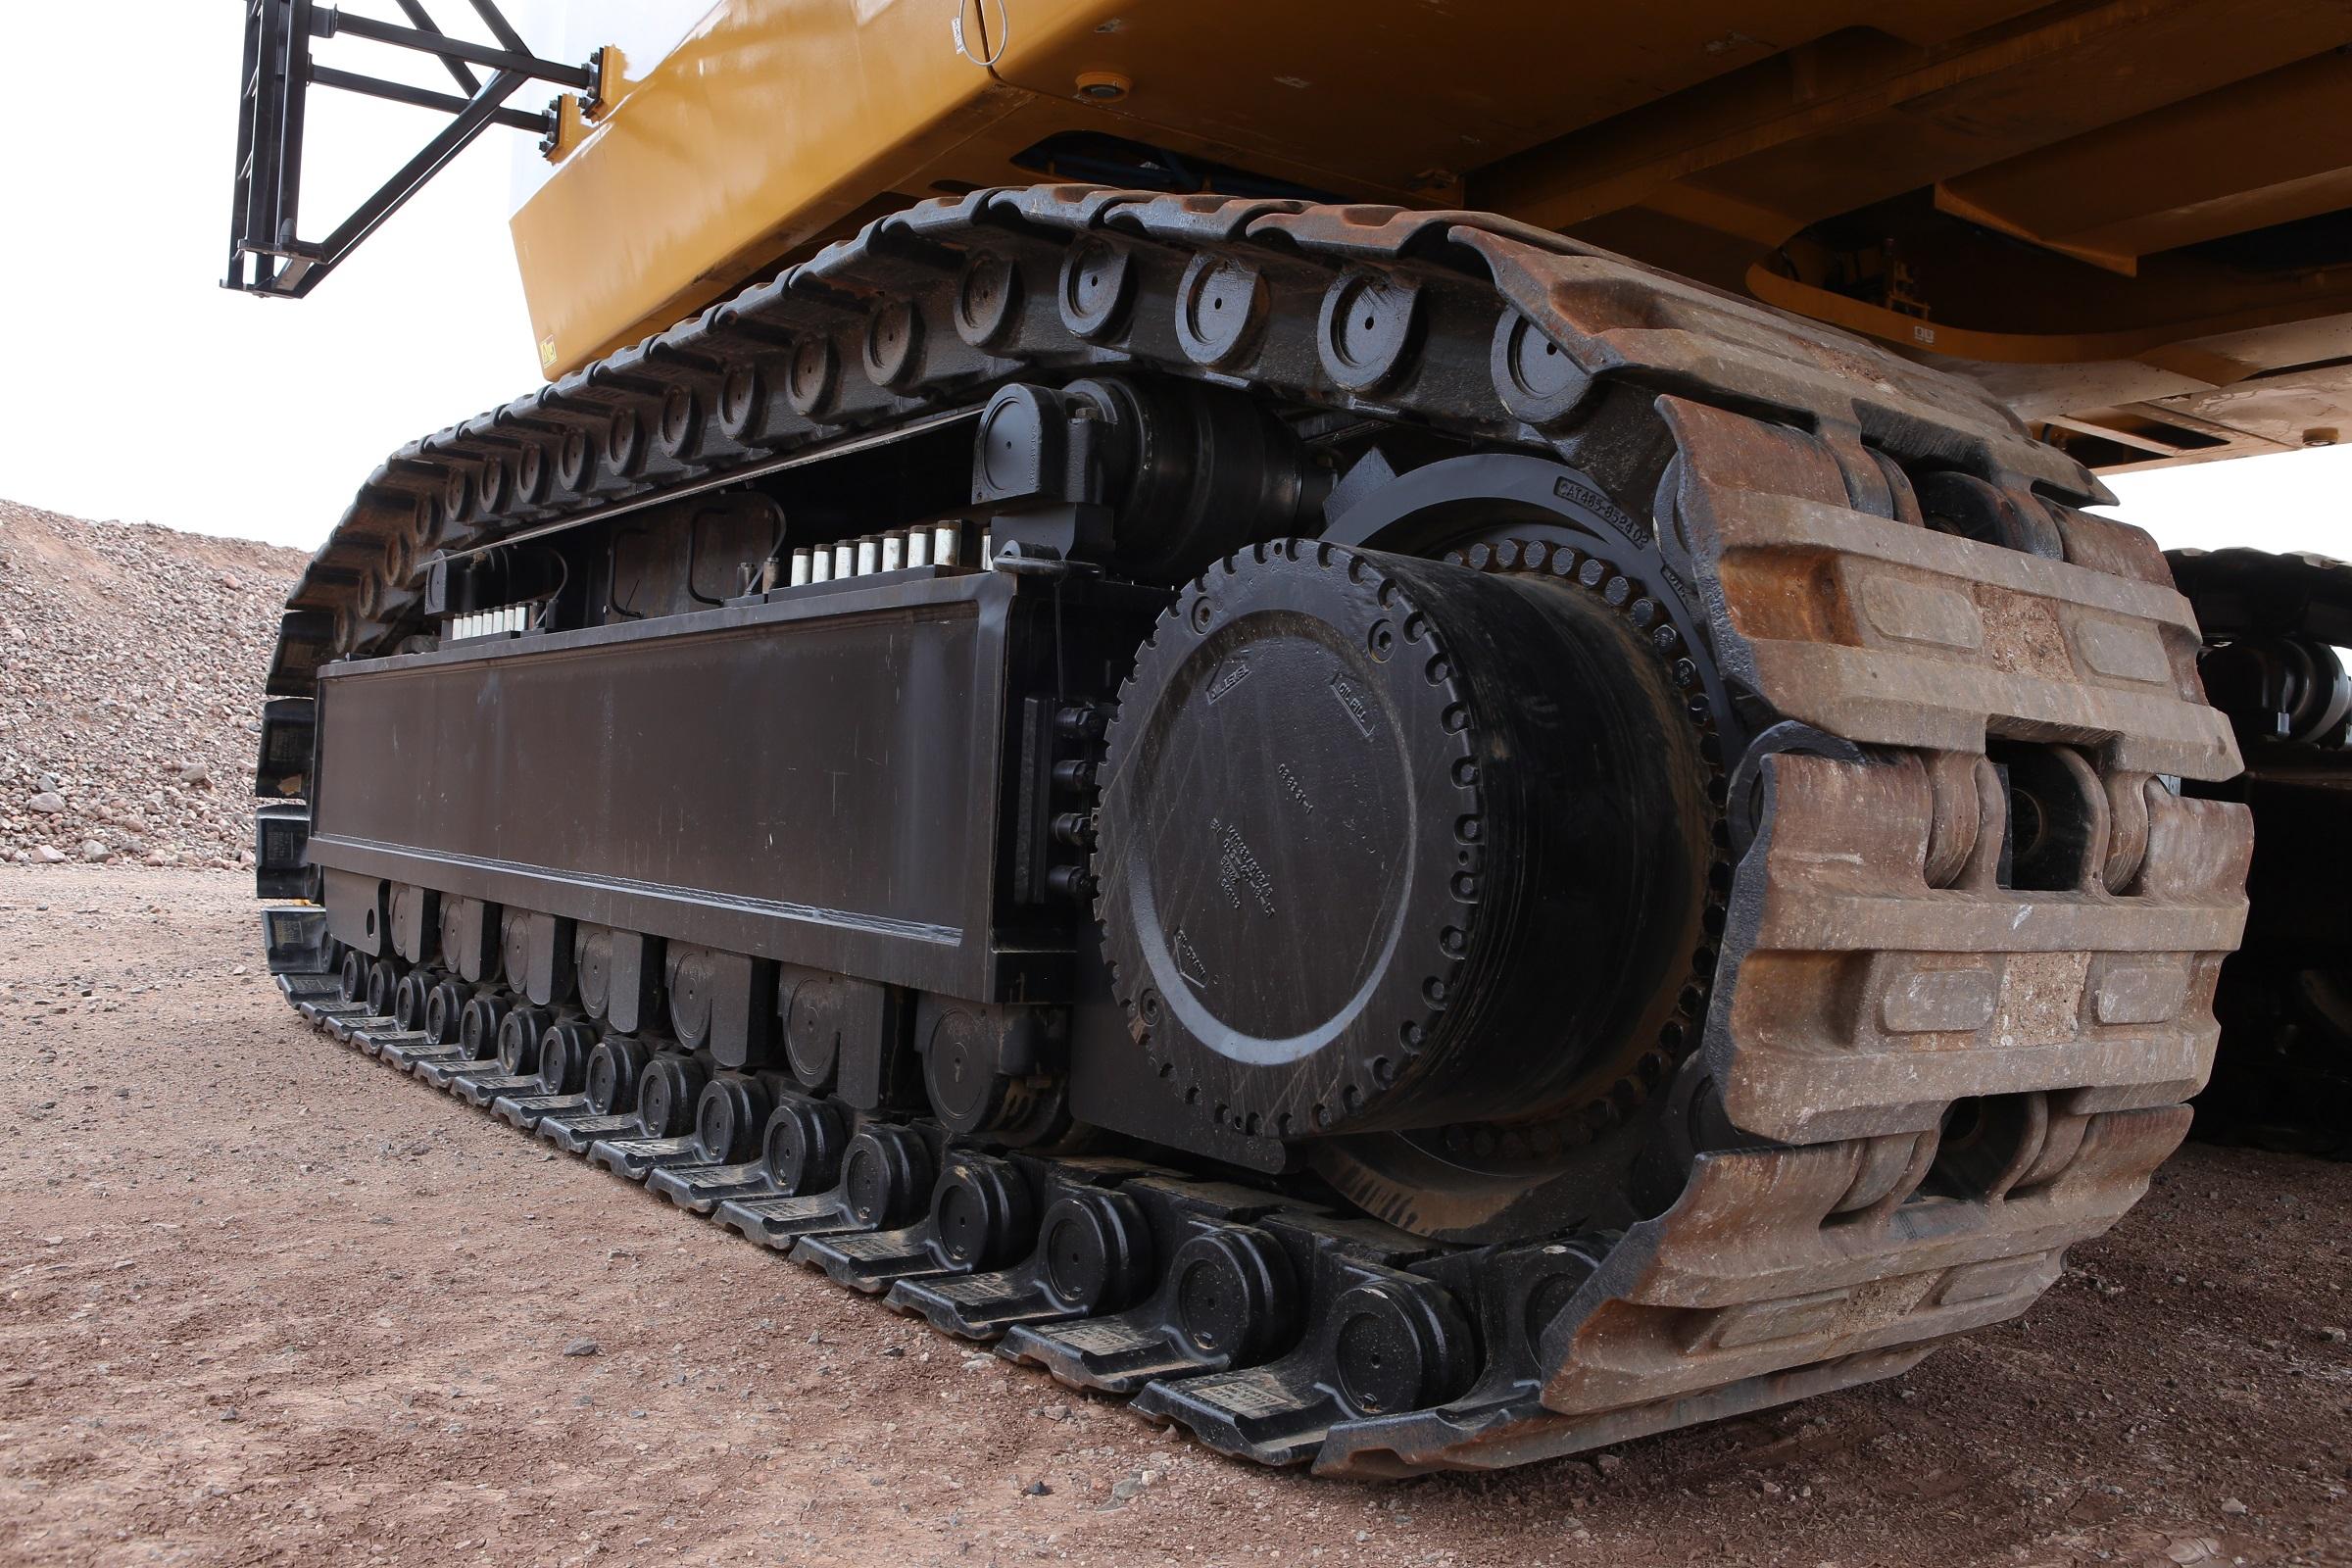 The Cat 6040 hydraulic mining shovel's heavy-duty undercarriage. Photo by Caterpillar